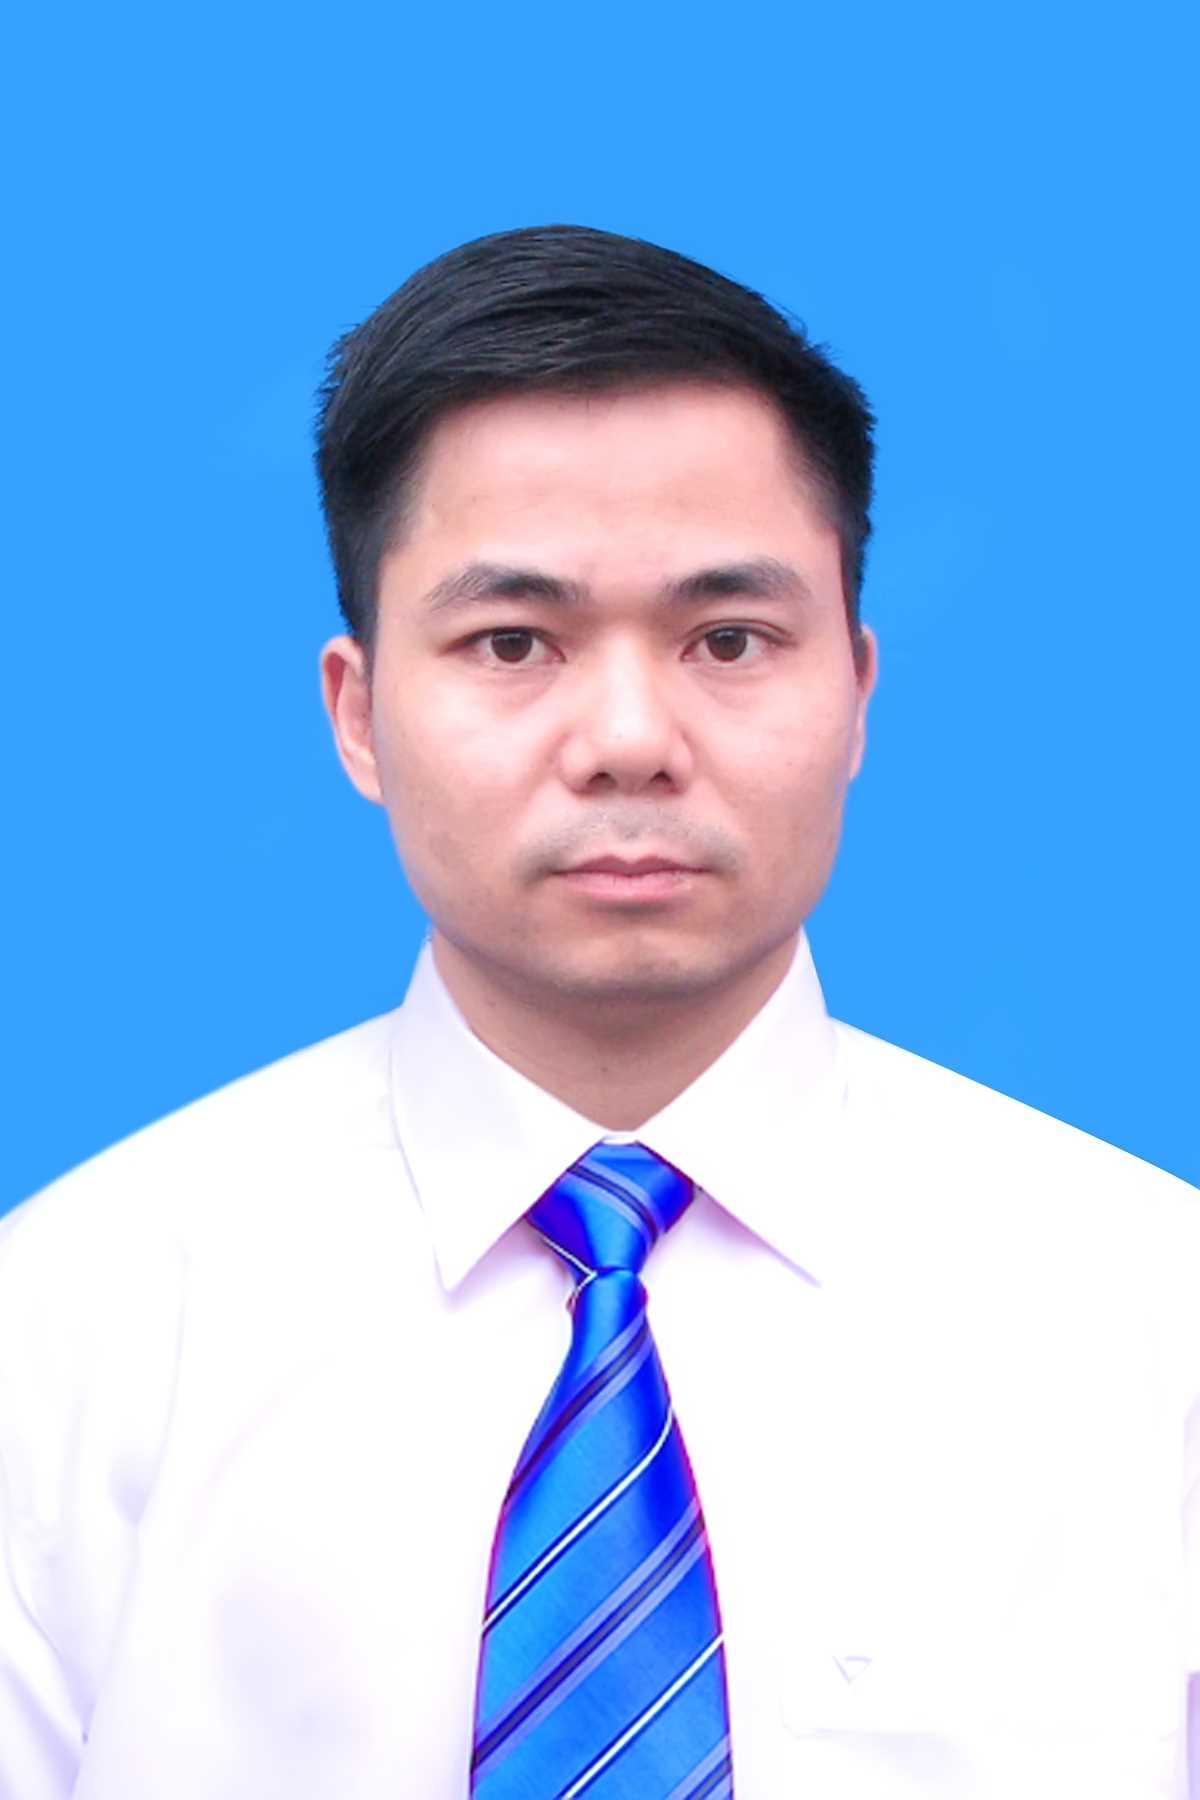 Copy of Tuan.jpg